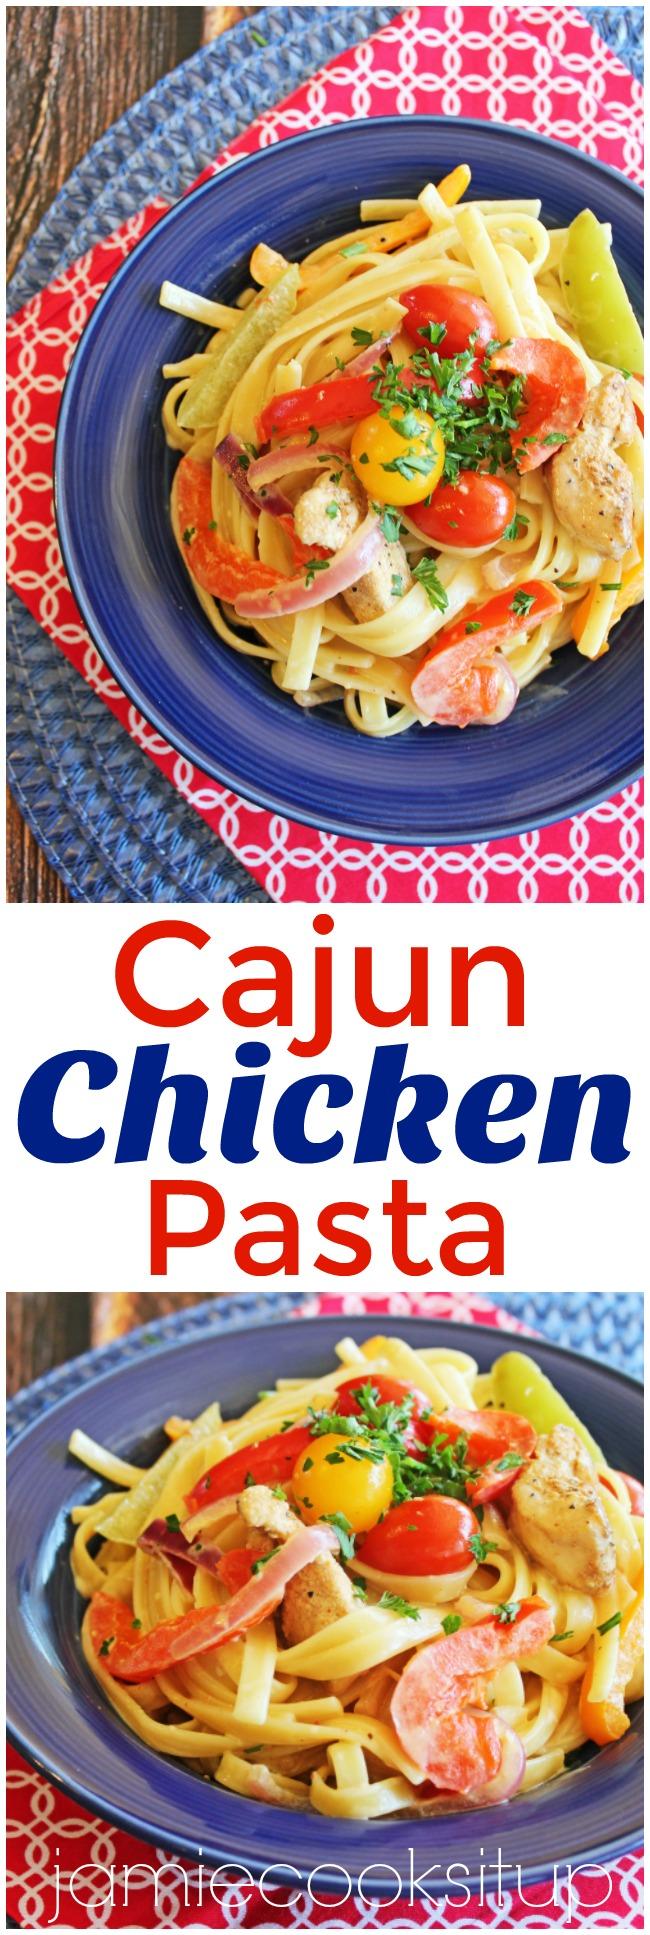 Cajun Chicken Pasta from Jamie Cooks It Up!